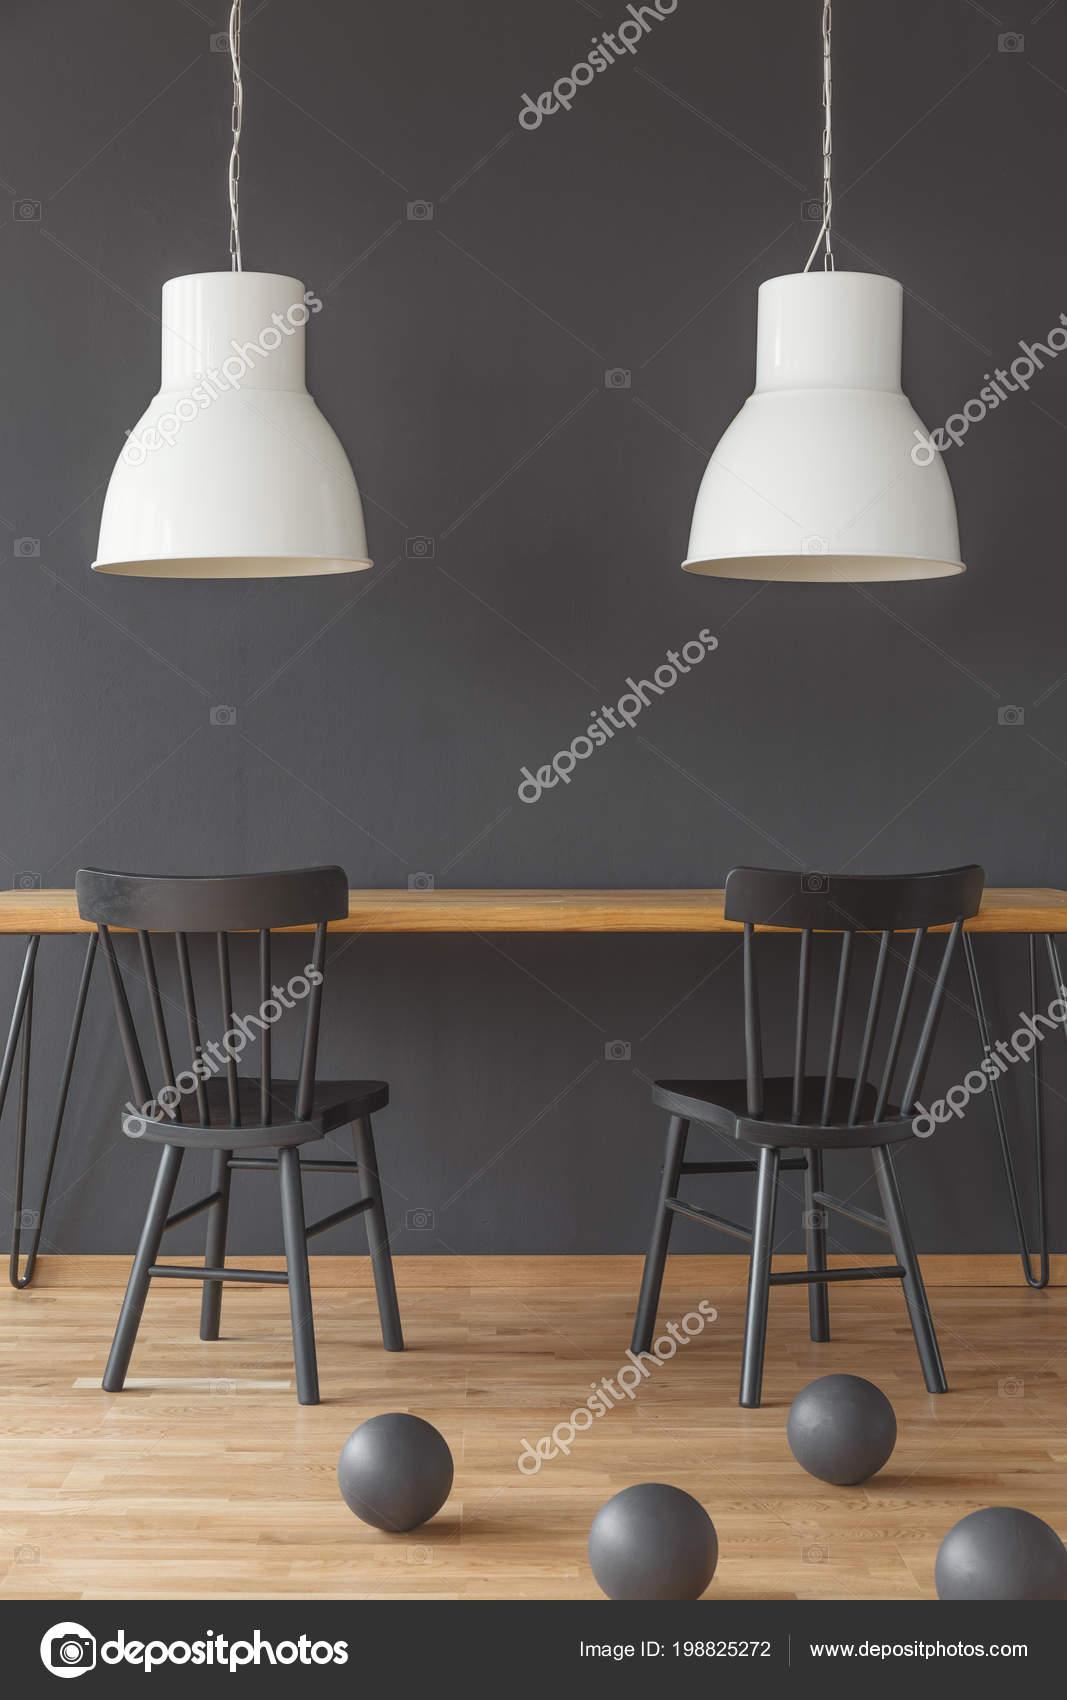 Witte Tafel Zwarte Stoelen.Zwarte Houten Tafel Houten Tafel Met Witte Stoelen Affordable